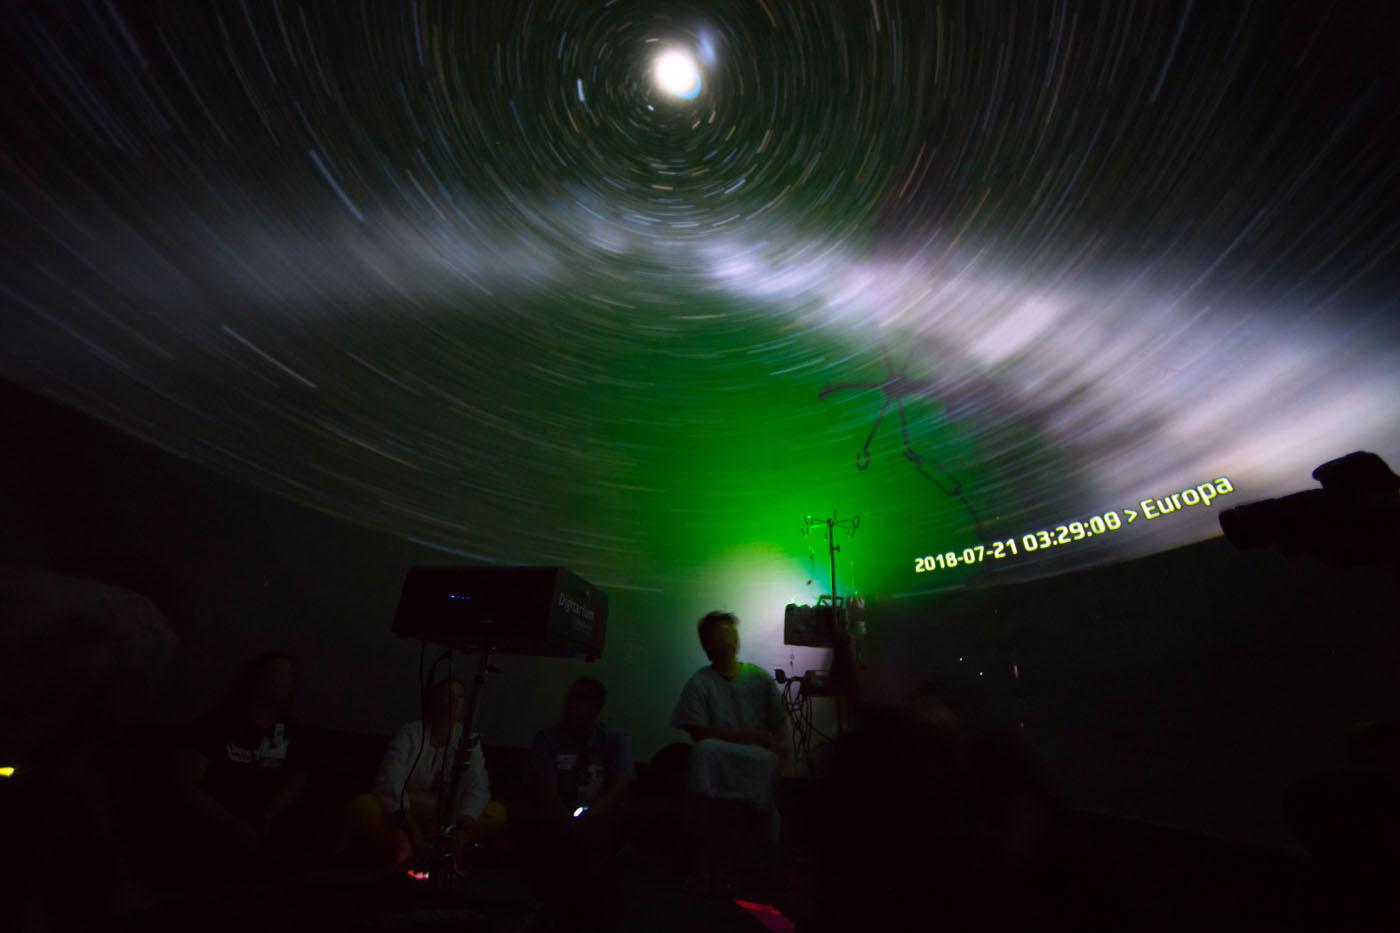 PlanetariumExhibit-CaltechCarnegie-Kaiser-1565.jpg